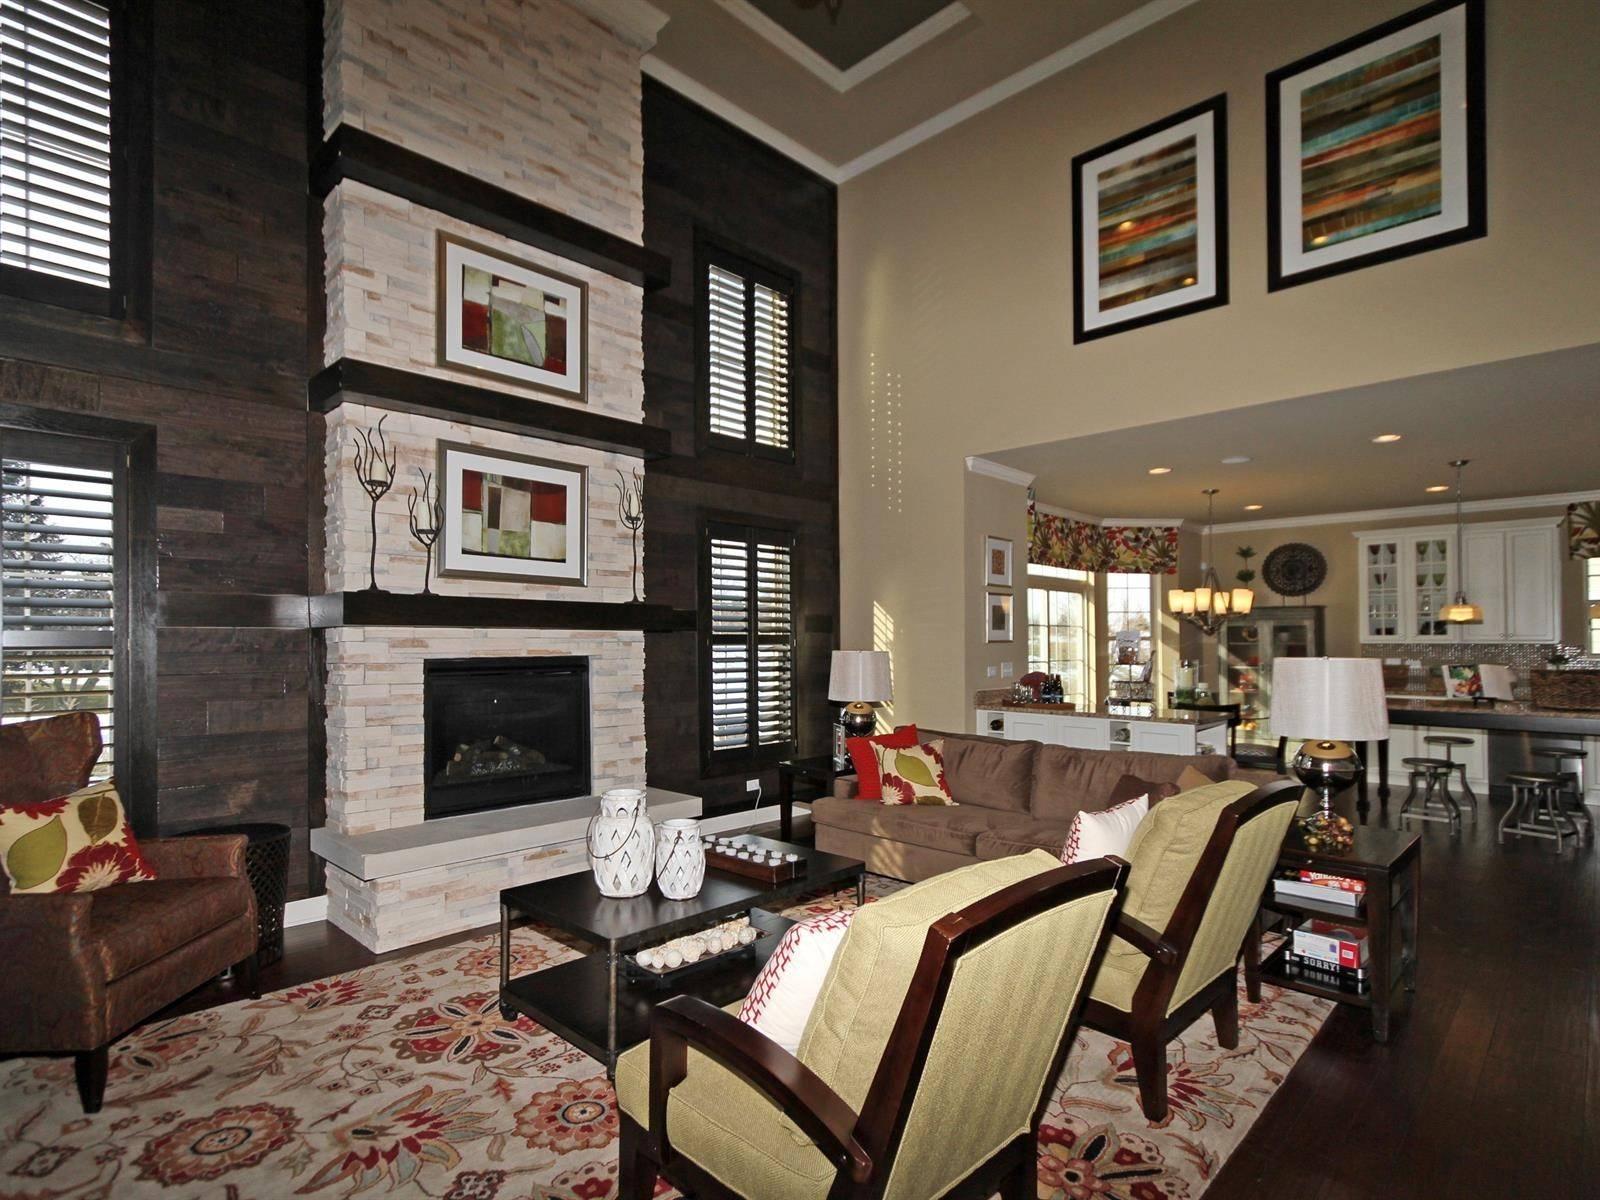 Interior Designers Model Homes Showcase Decor Trends Modern Living Room Fireplace With TV Home